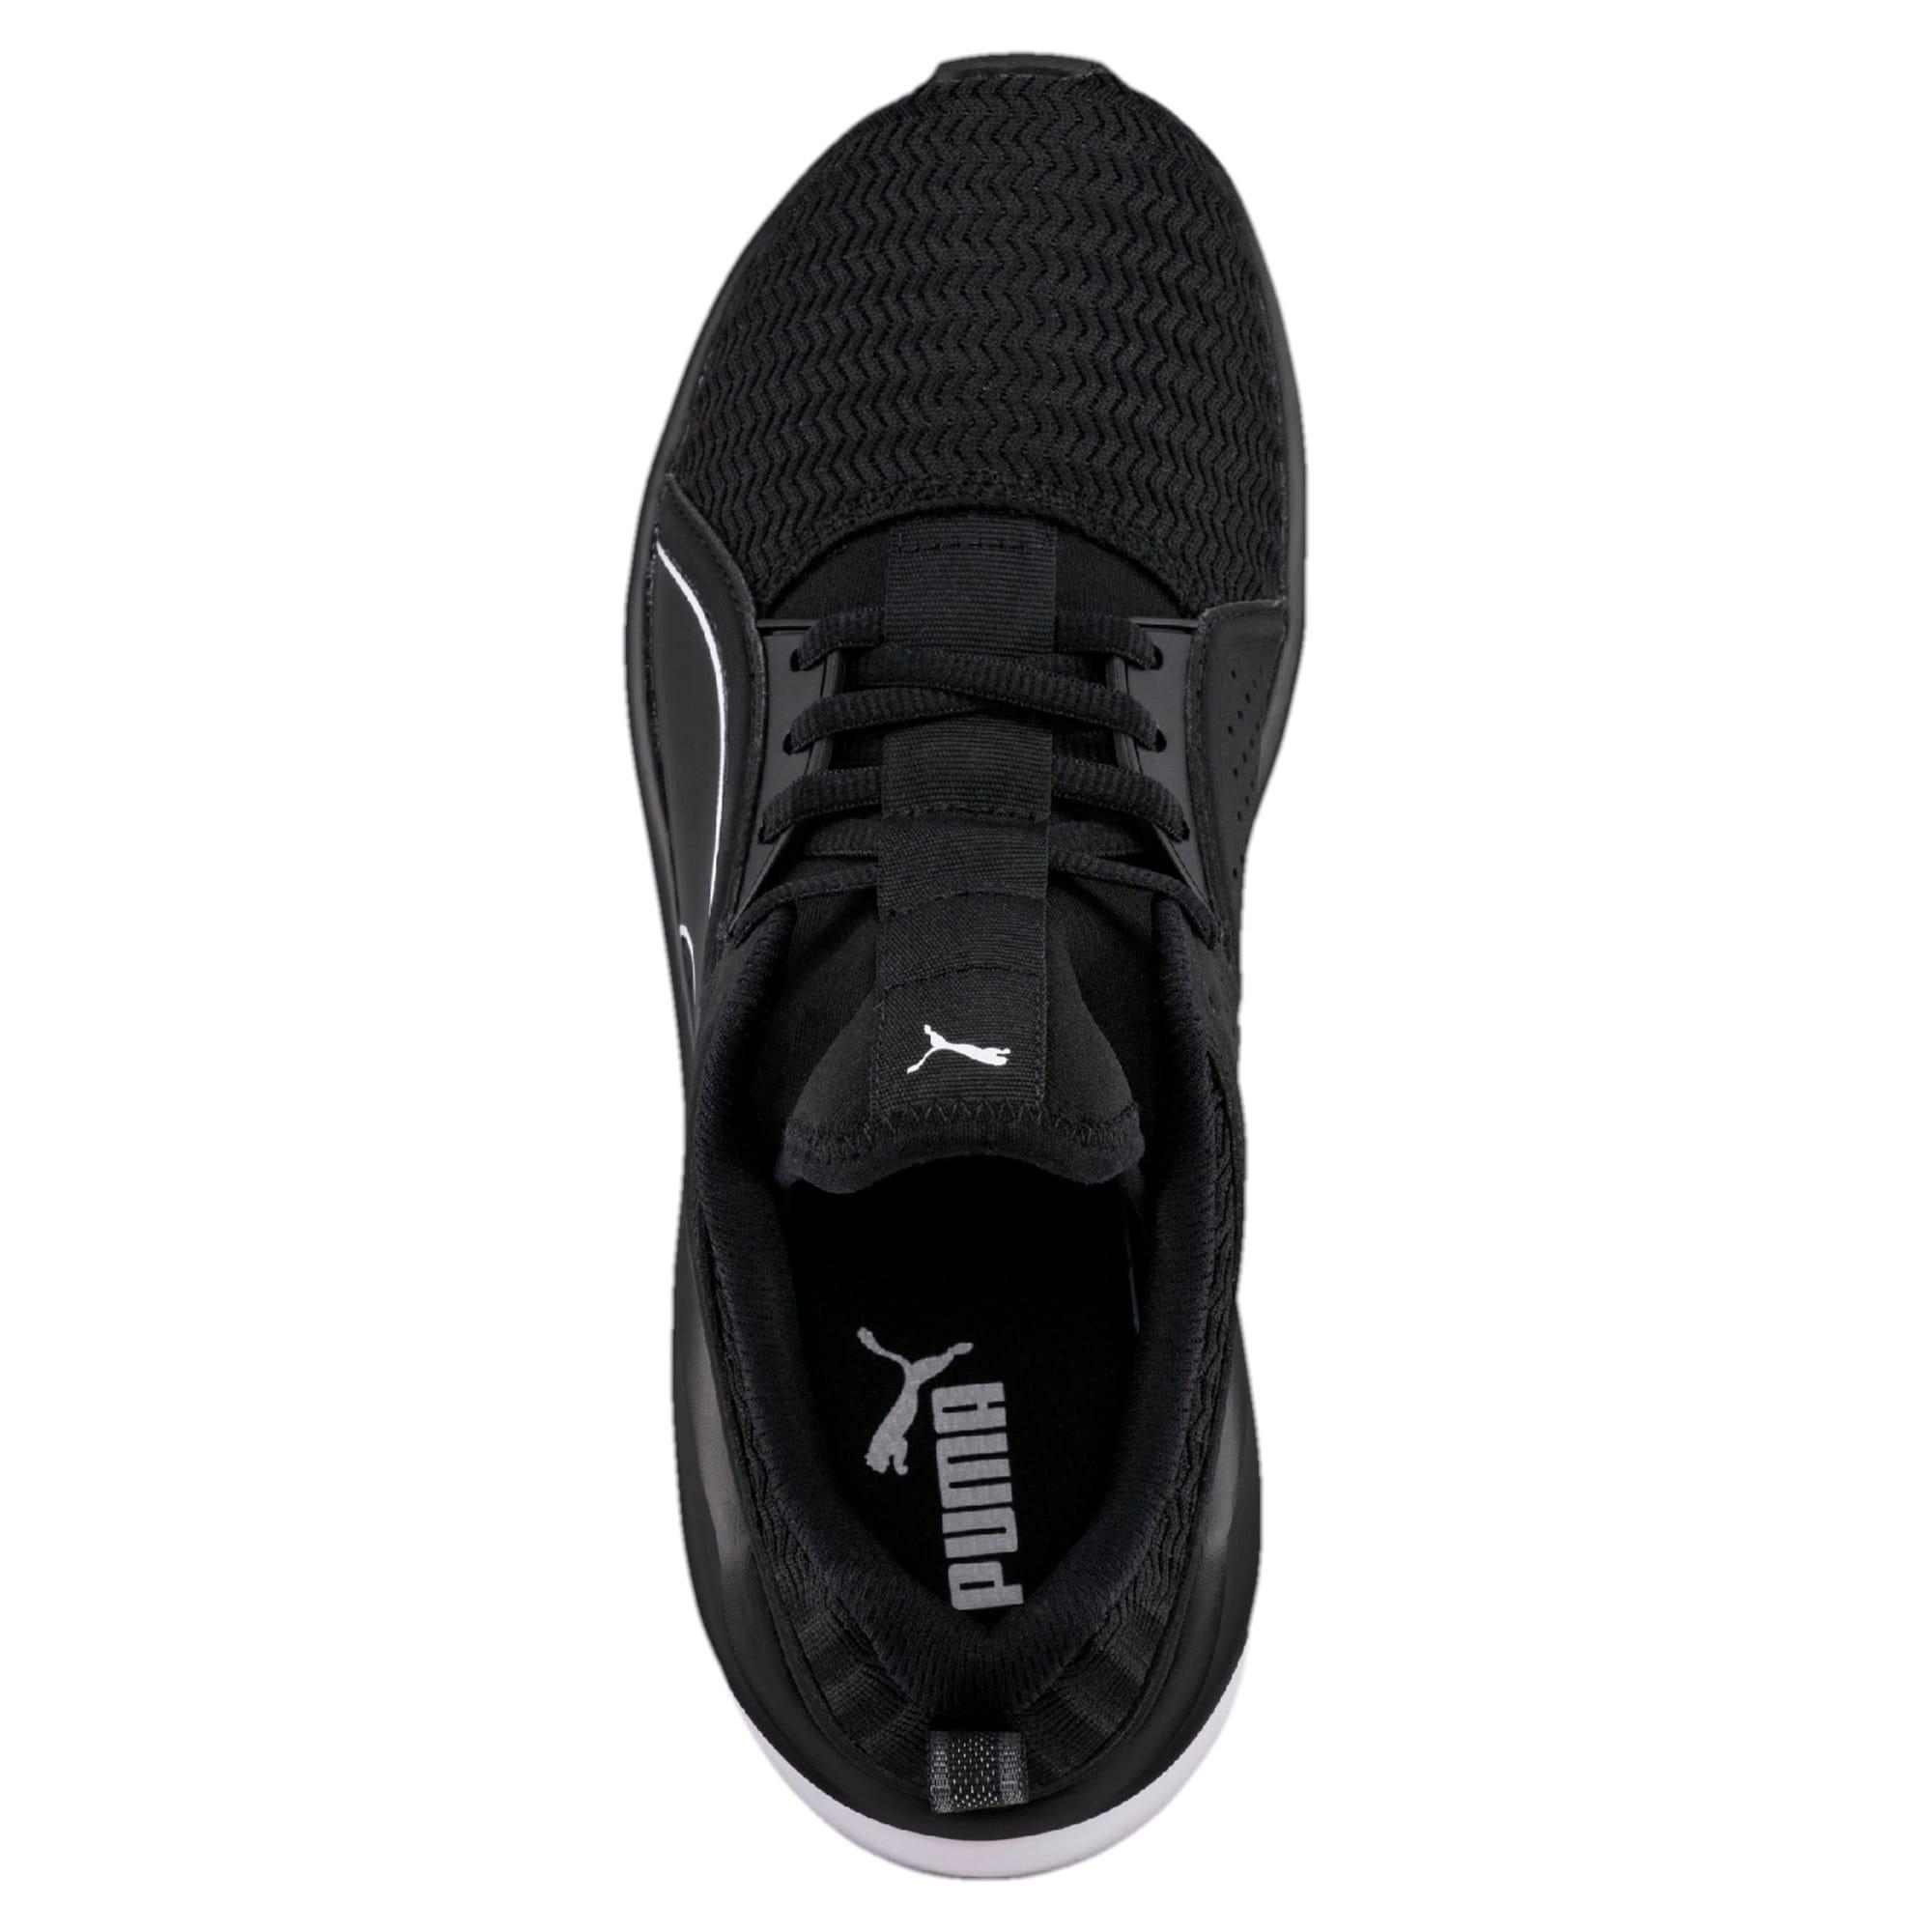 Thumbnail 4 of Fierce Lace Core Women's Training Shoes, Puma Black-Puma White, medium-IND